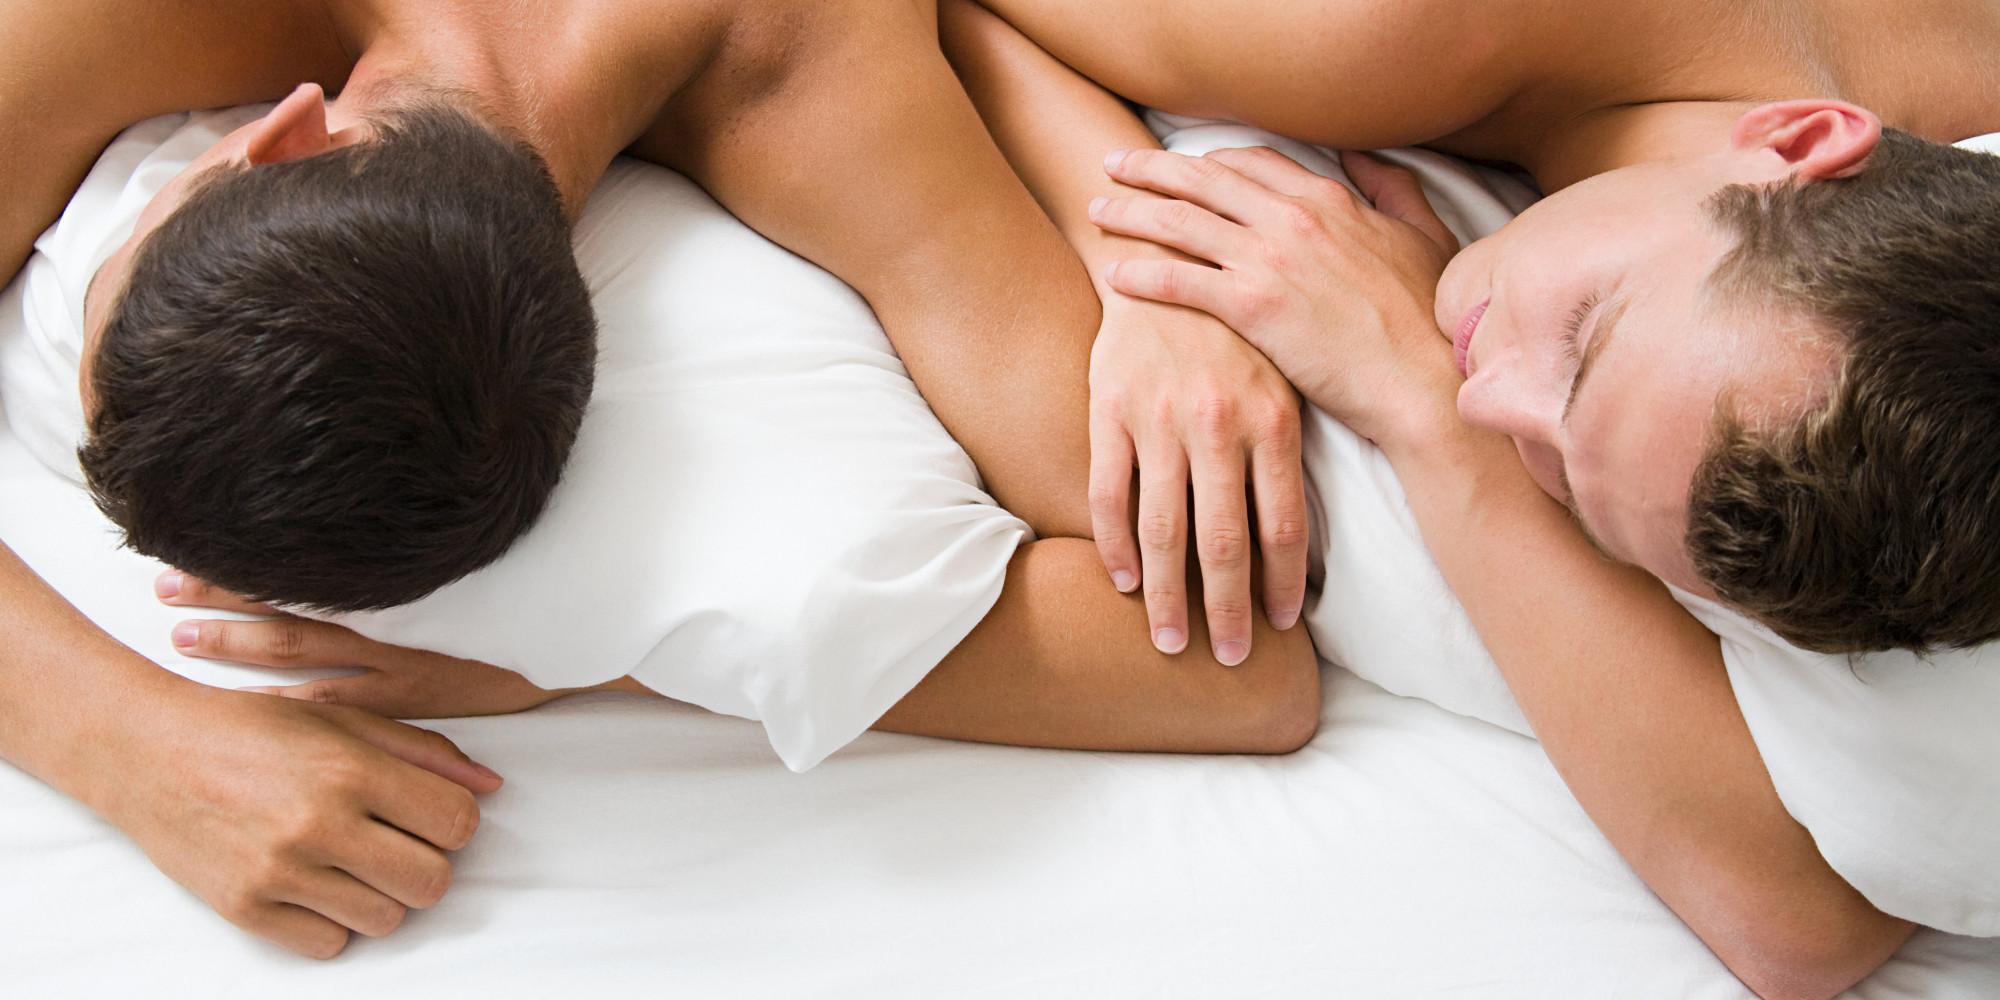 men having sex with women pictures  68344